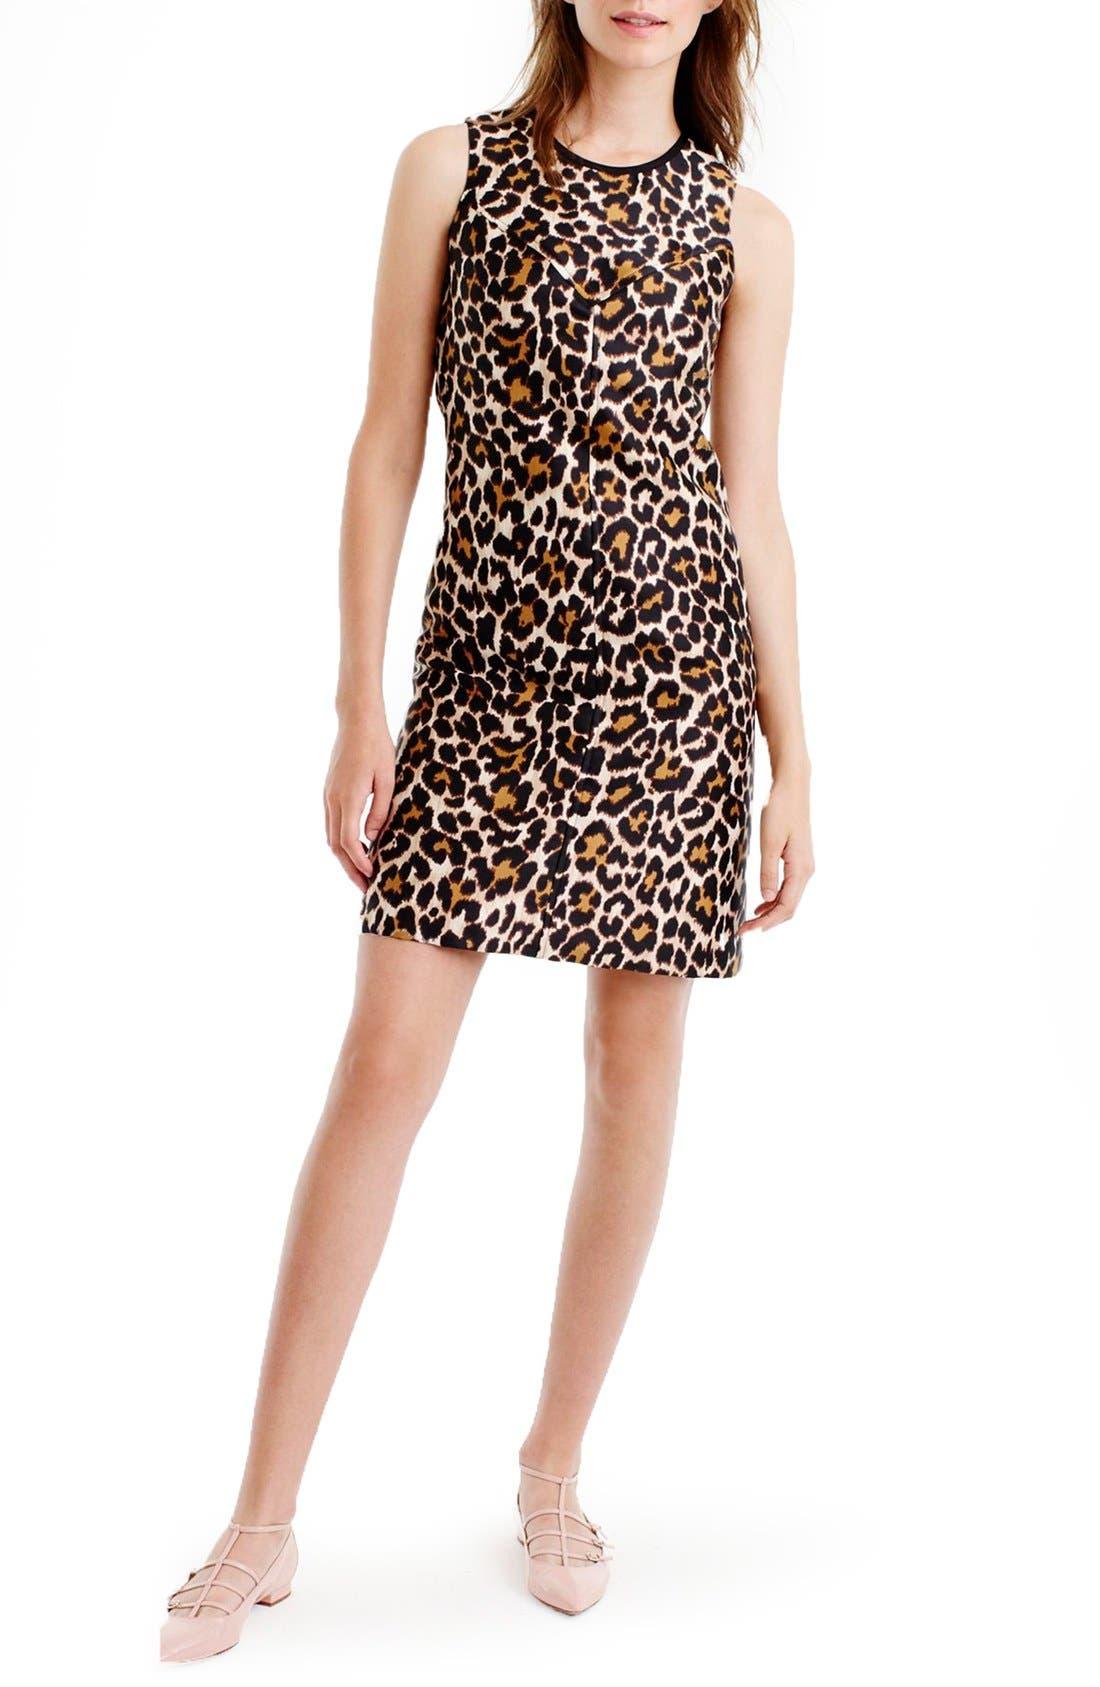 Alternate Image 1 Selected - J.Crew Leopard Print Shift Dress (Regular & Petite)